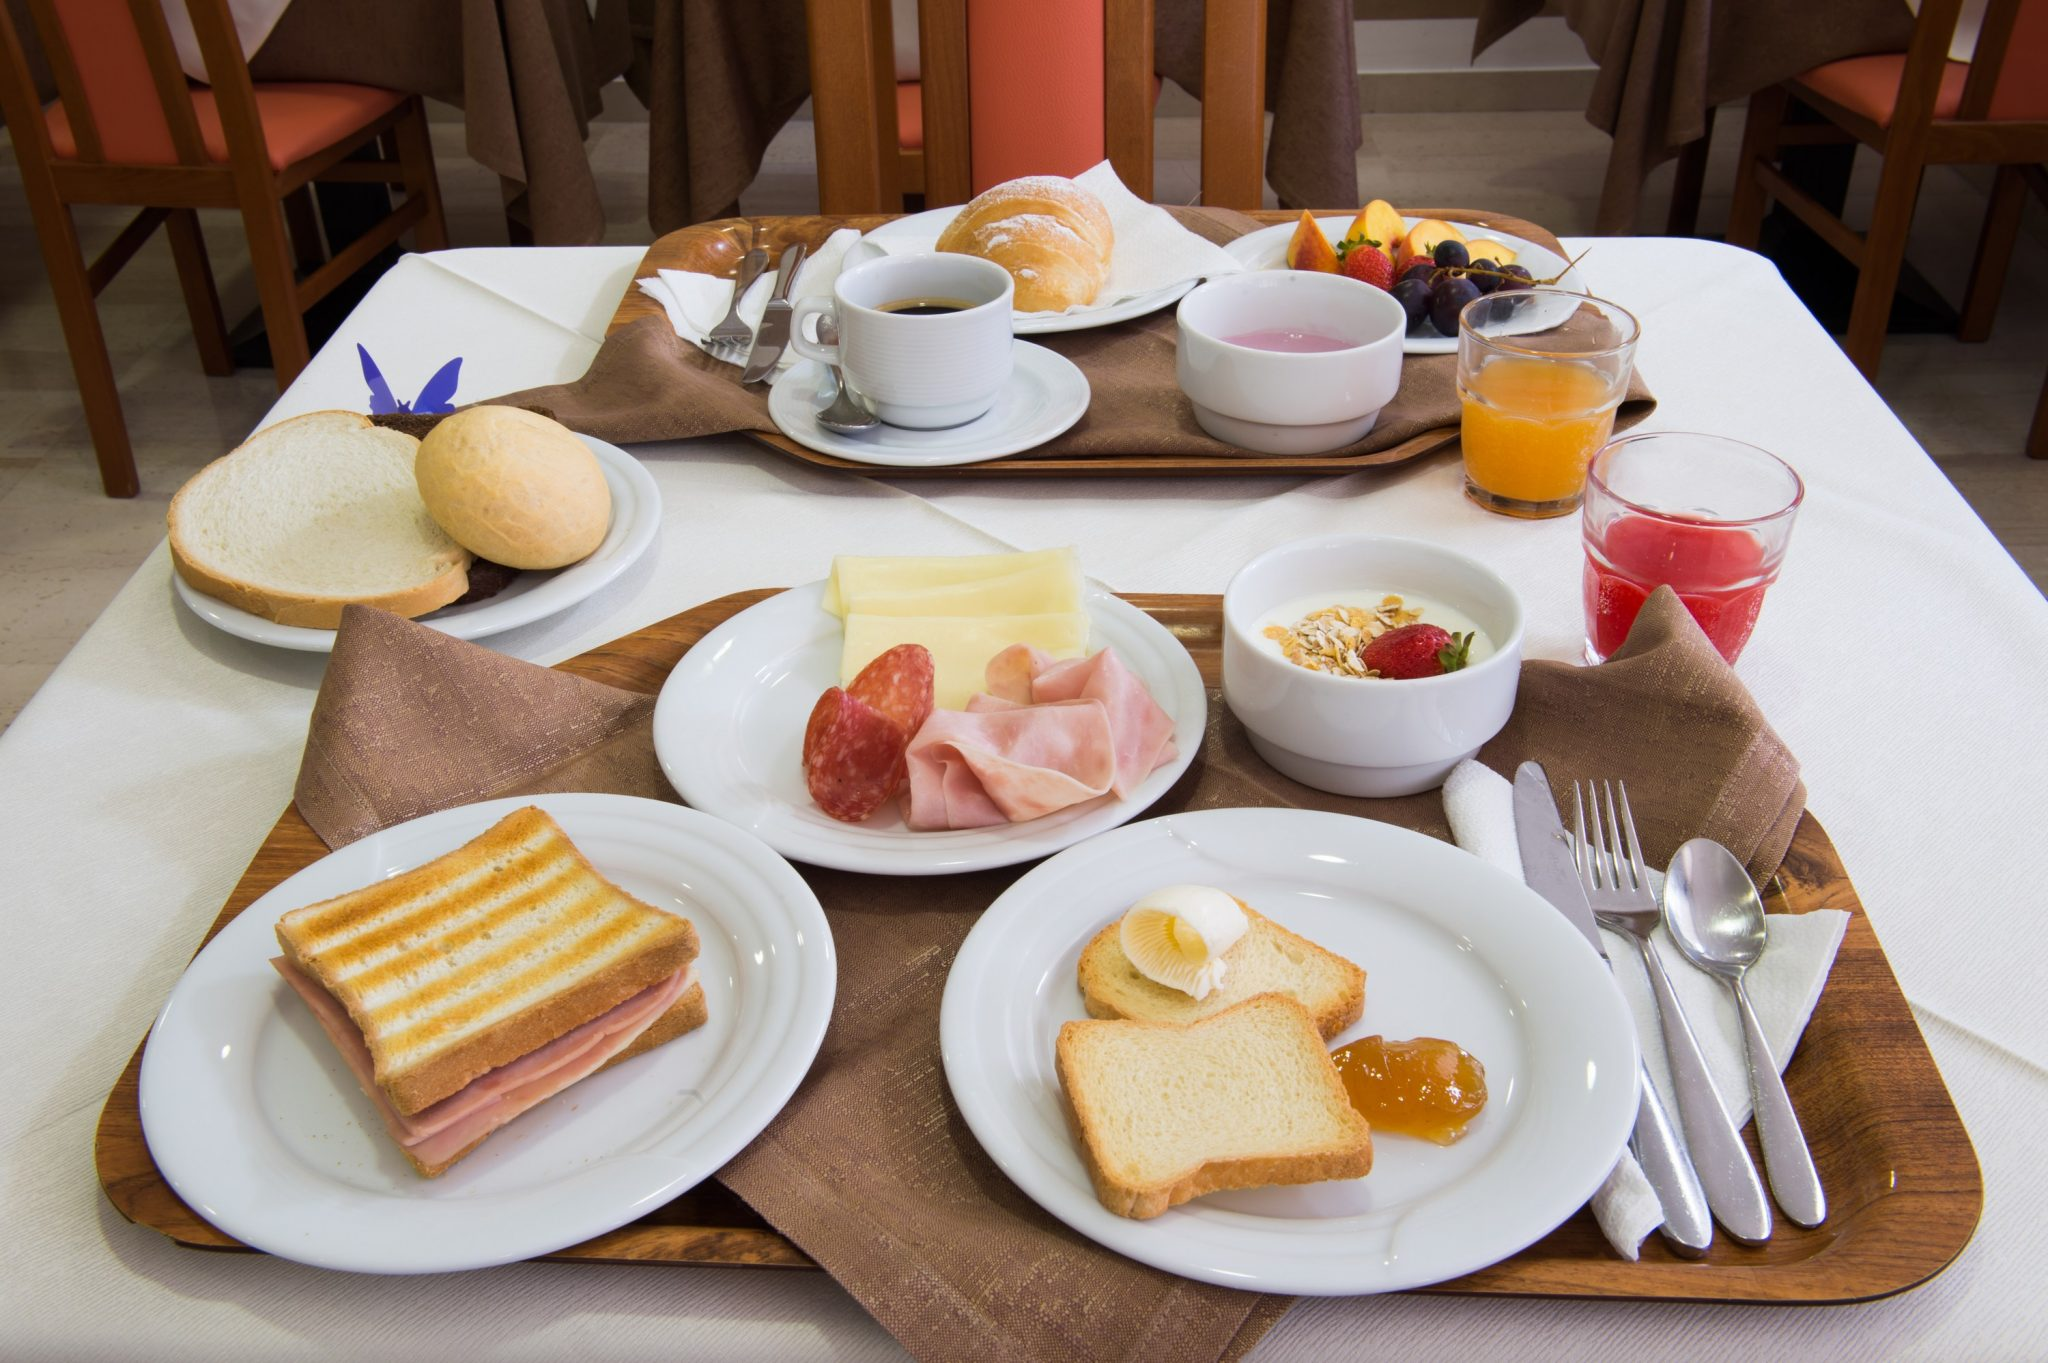 http://www.hotelvenezuela.it/wp-content/uploads/2016/11/mini-HVE_0137.jpg